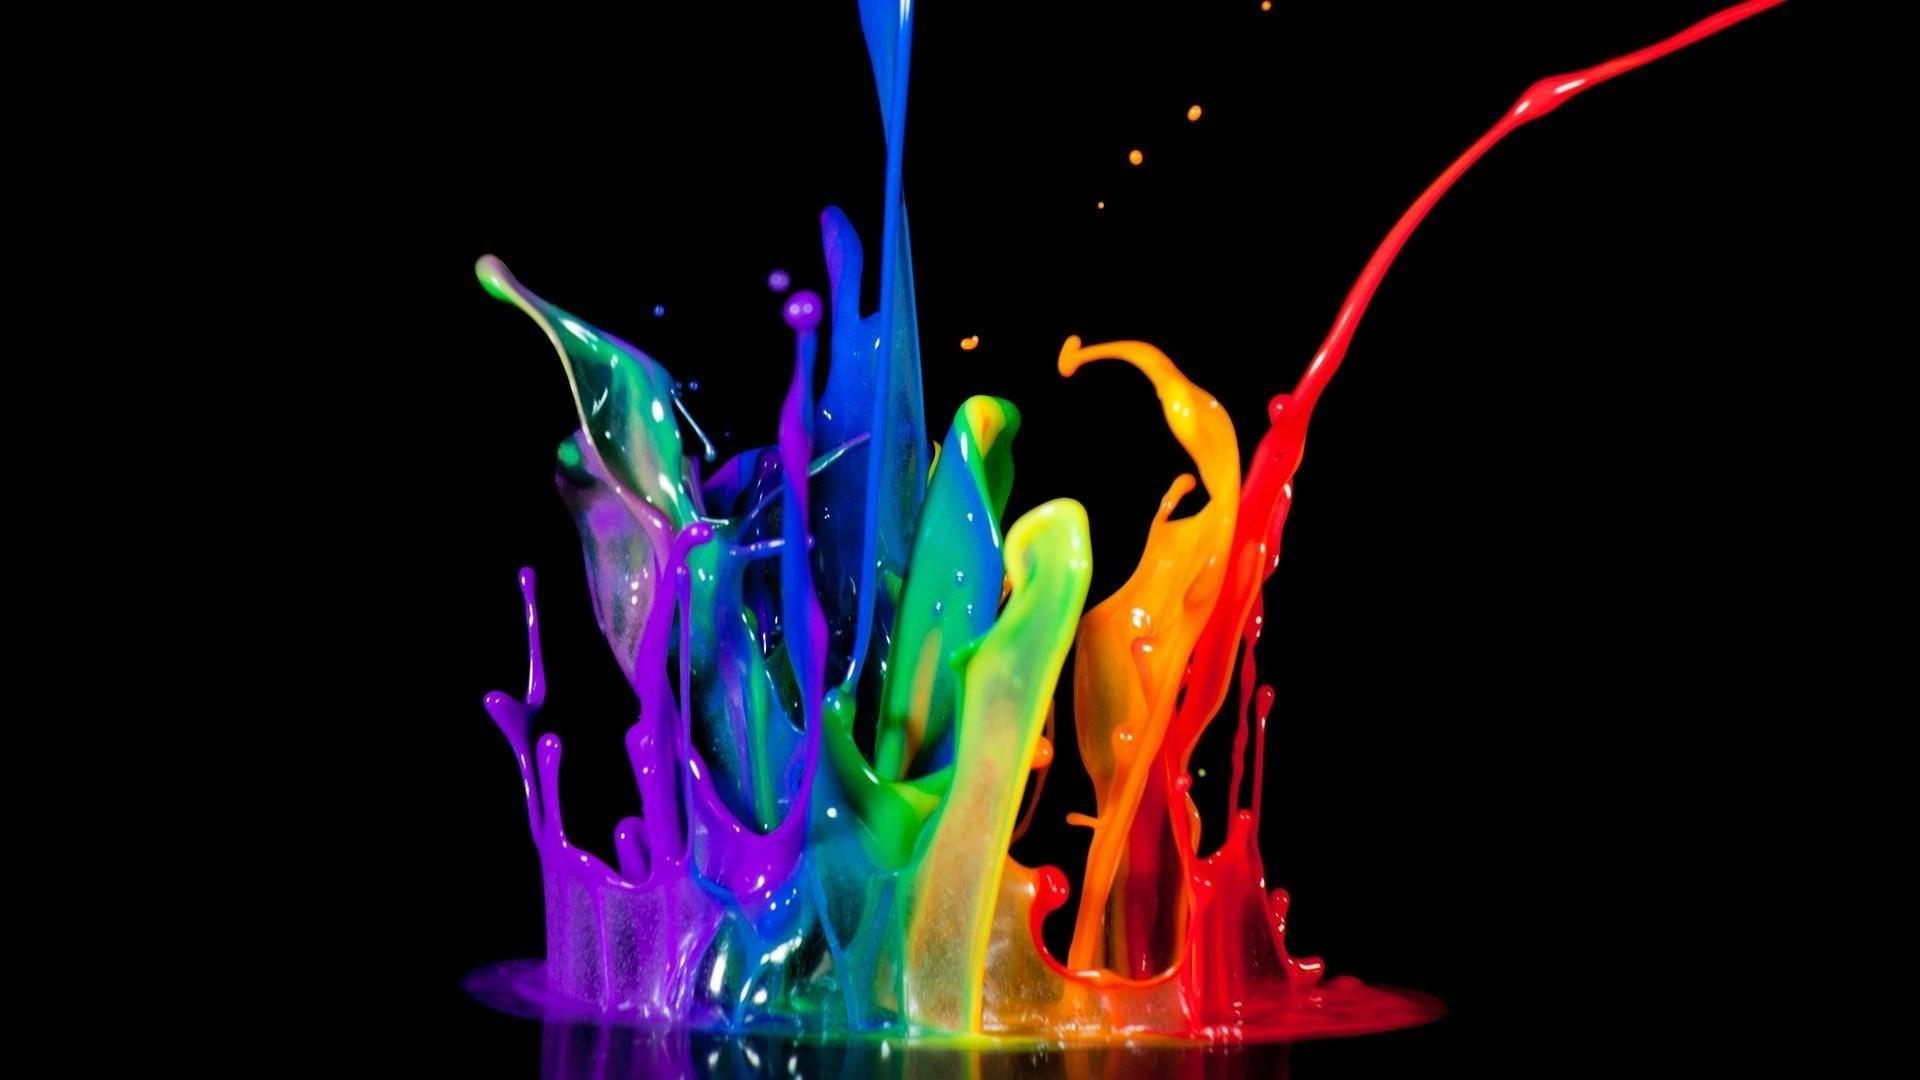 Paint Splash hd desktop wallpaper